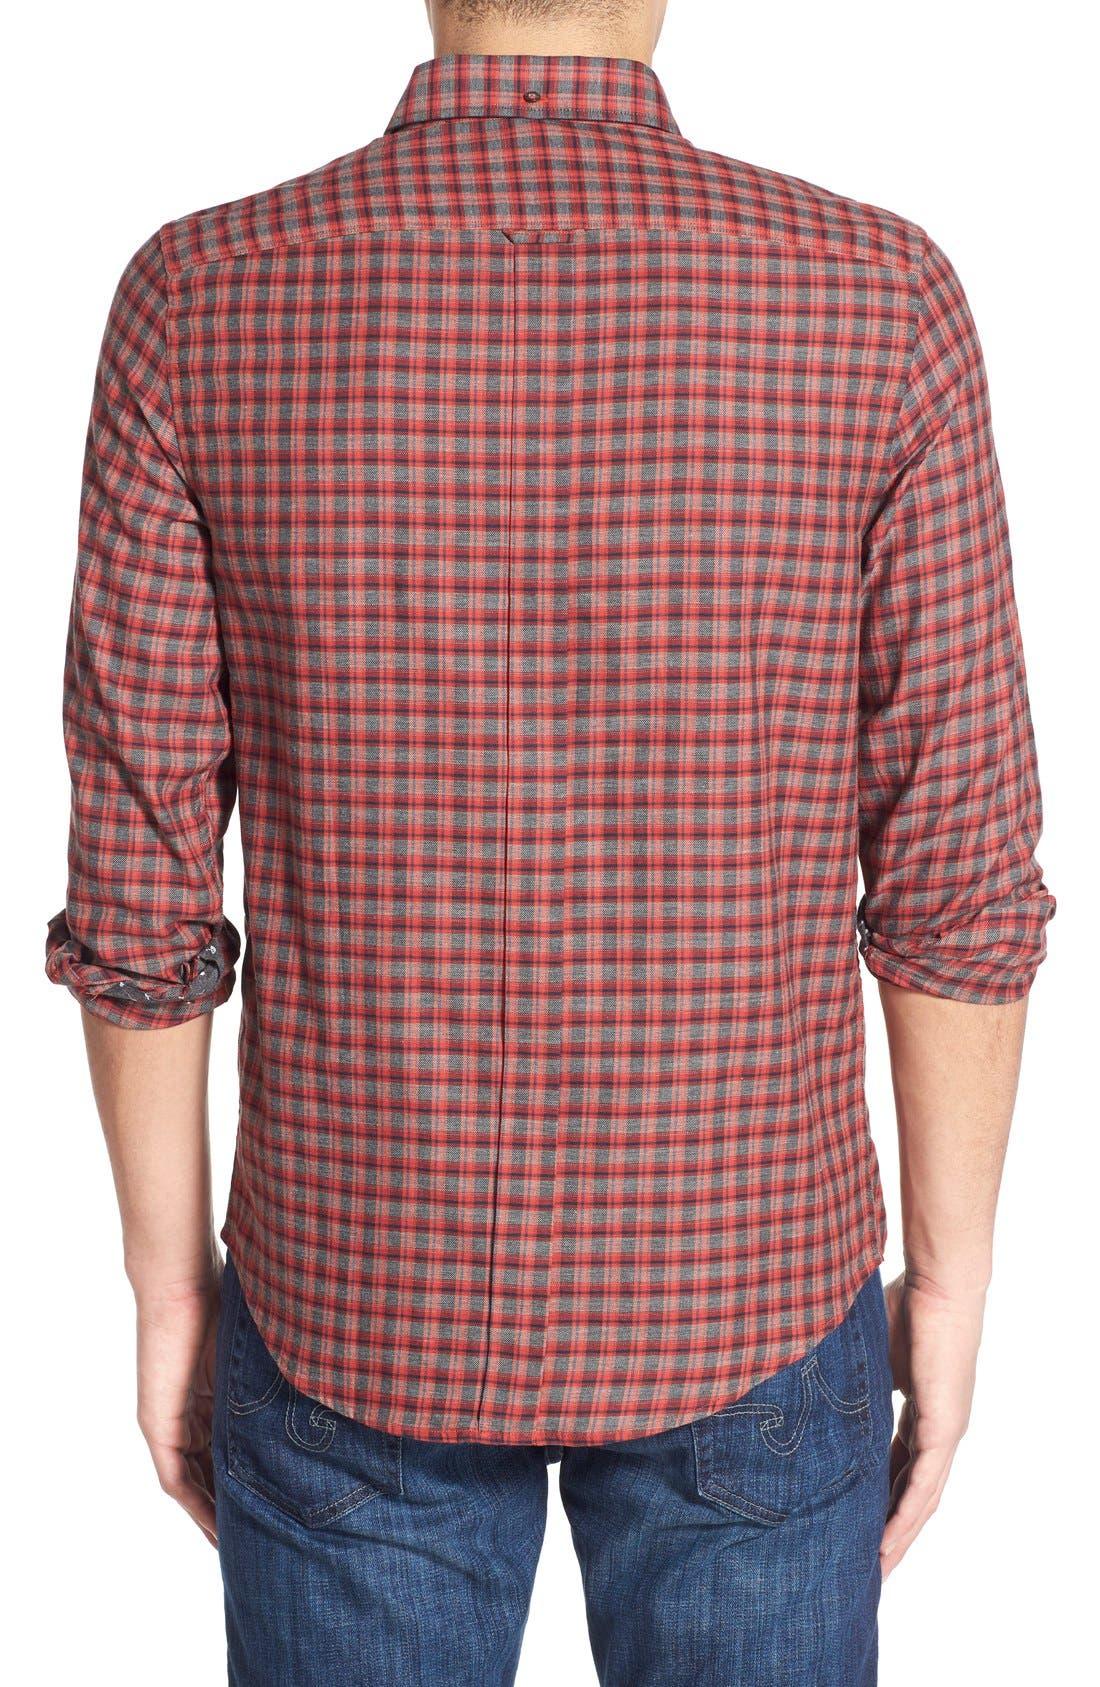 Alternate Image 2  - Ben Sherman Mod Fit Tartan Plaid Sport Shirt